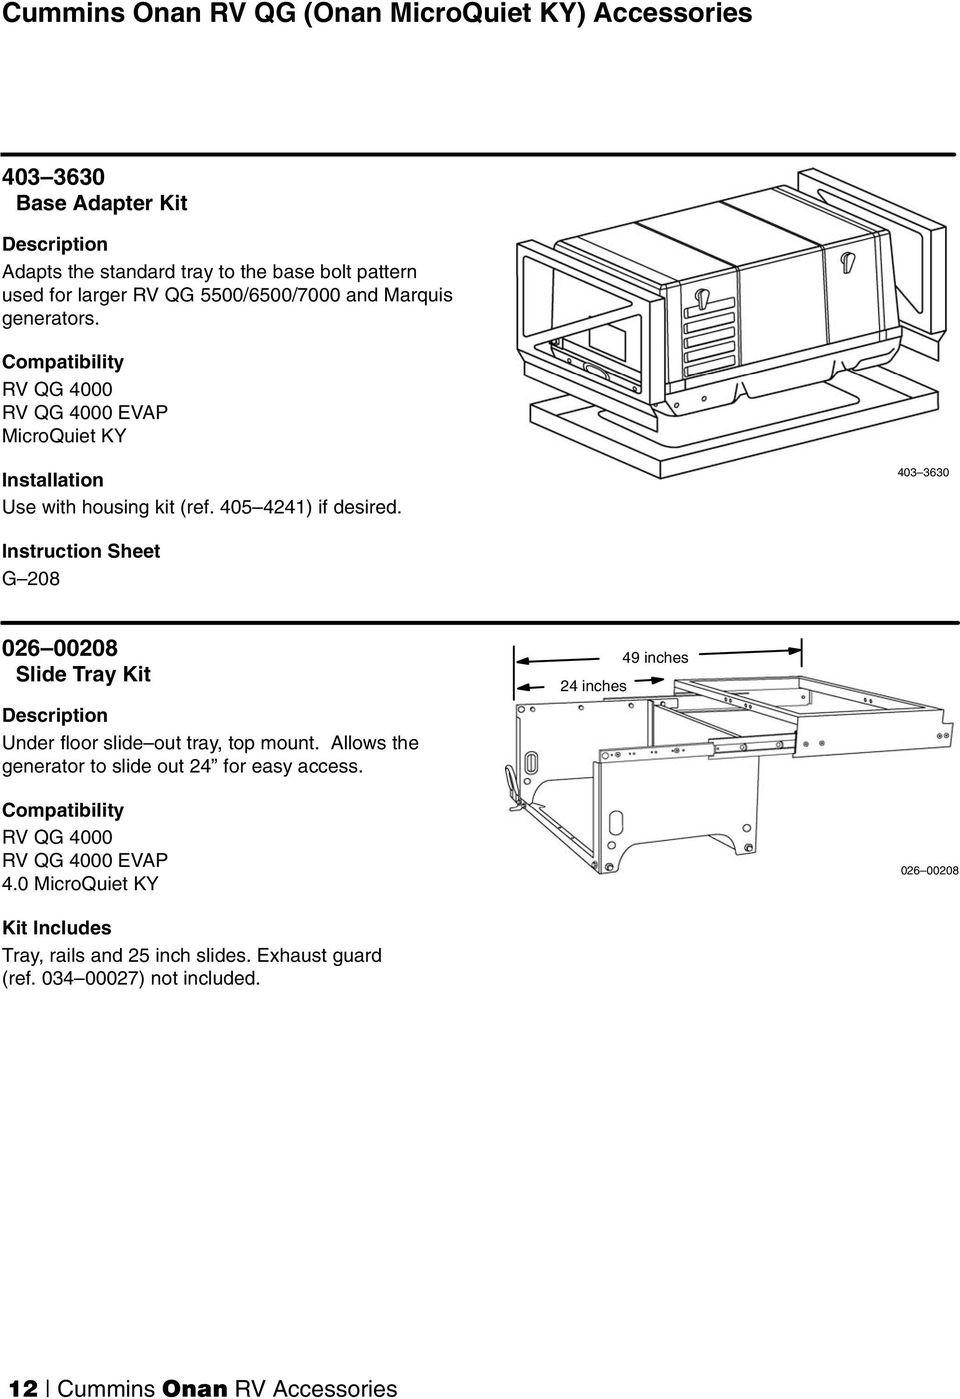 403 3630 Instruction Sheet G 208 026 Slide Tray Kit Under floor slide out tray